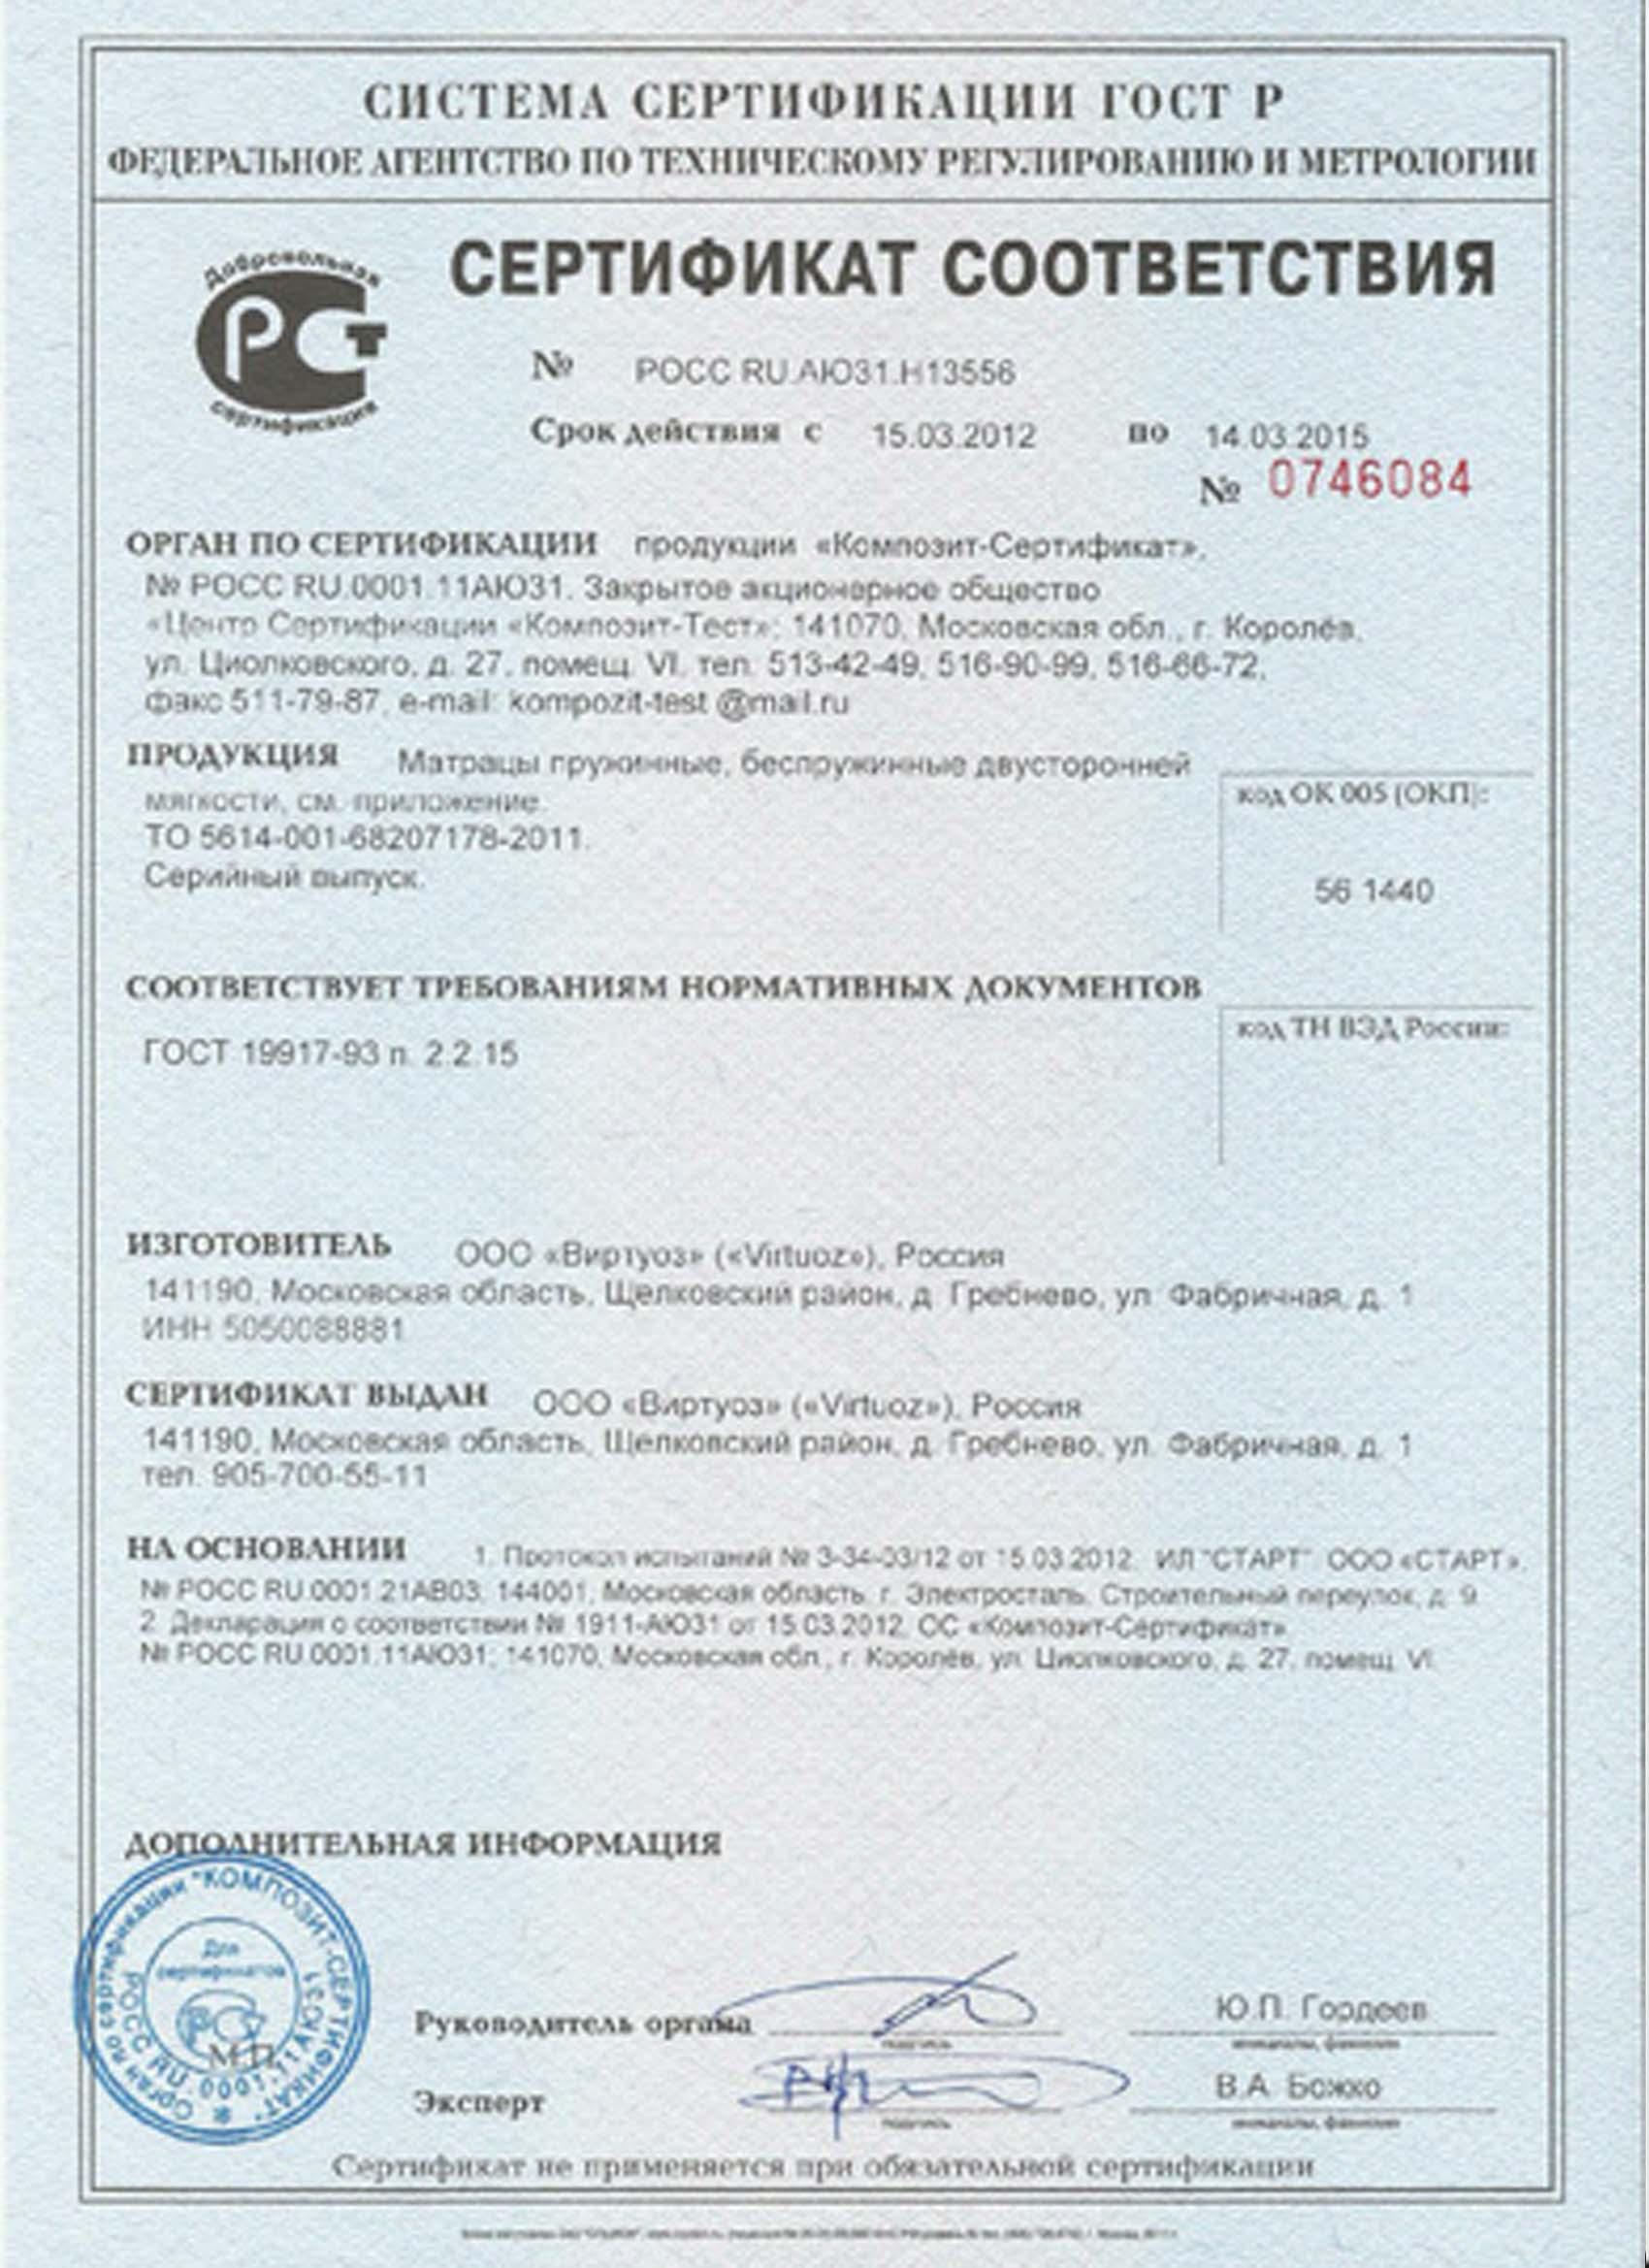 sertifikat_sootvetstviya_2.jpg